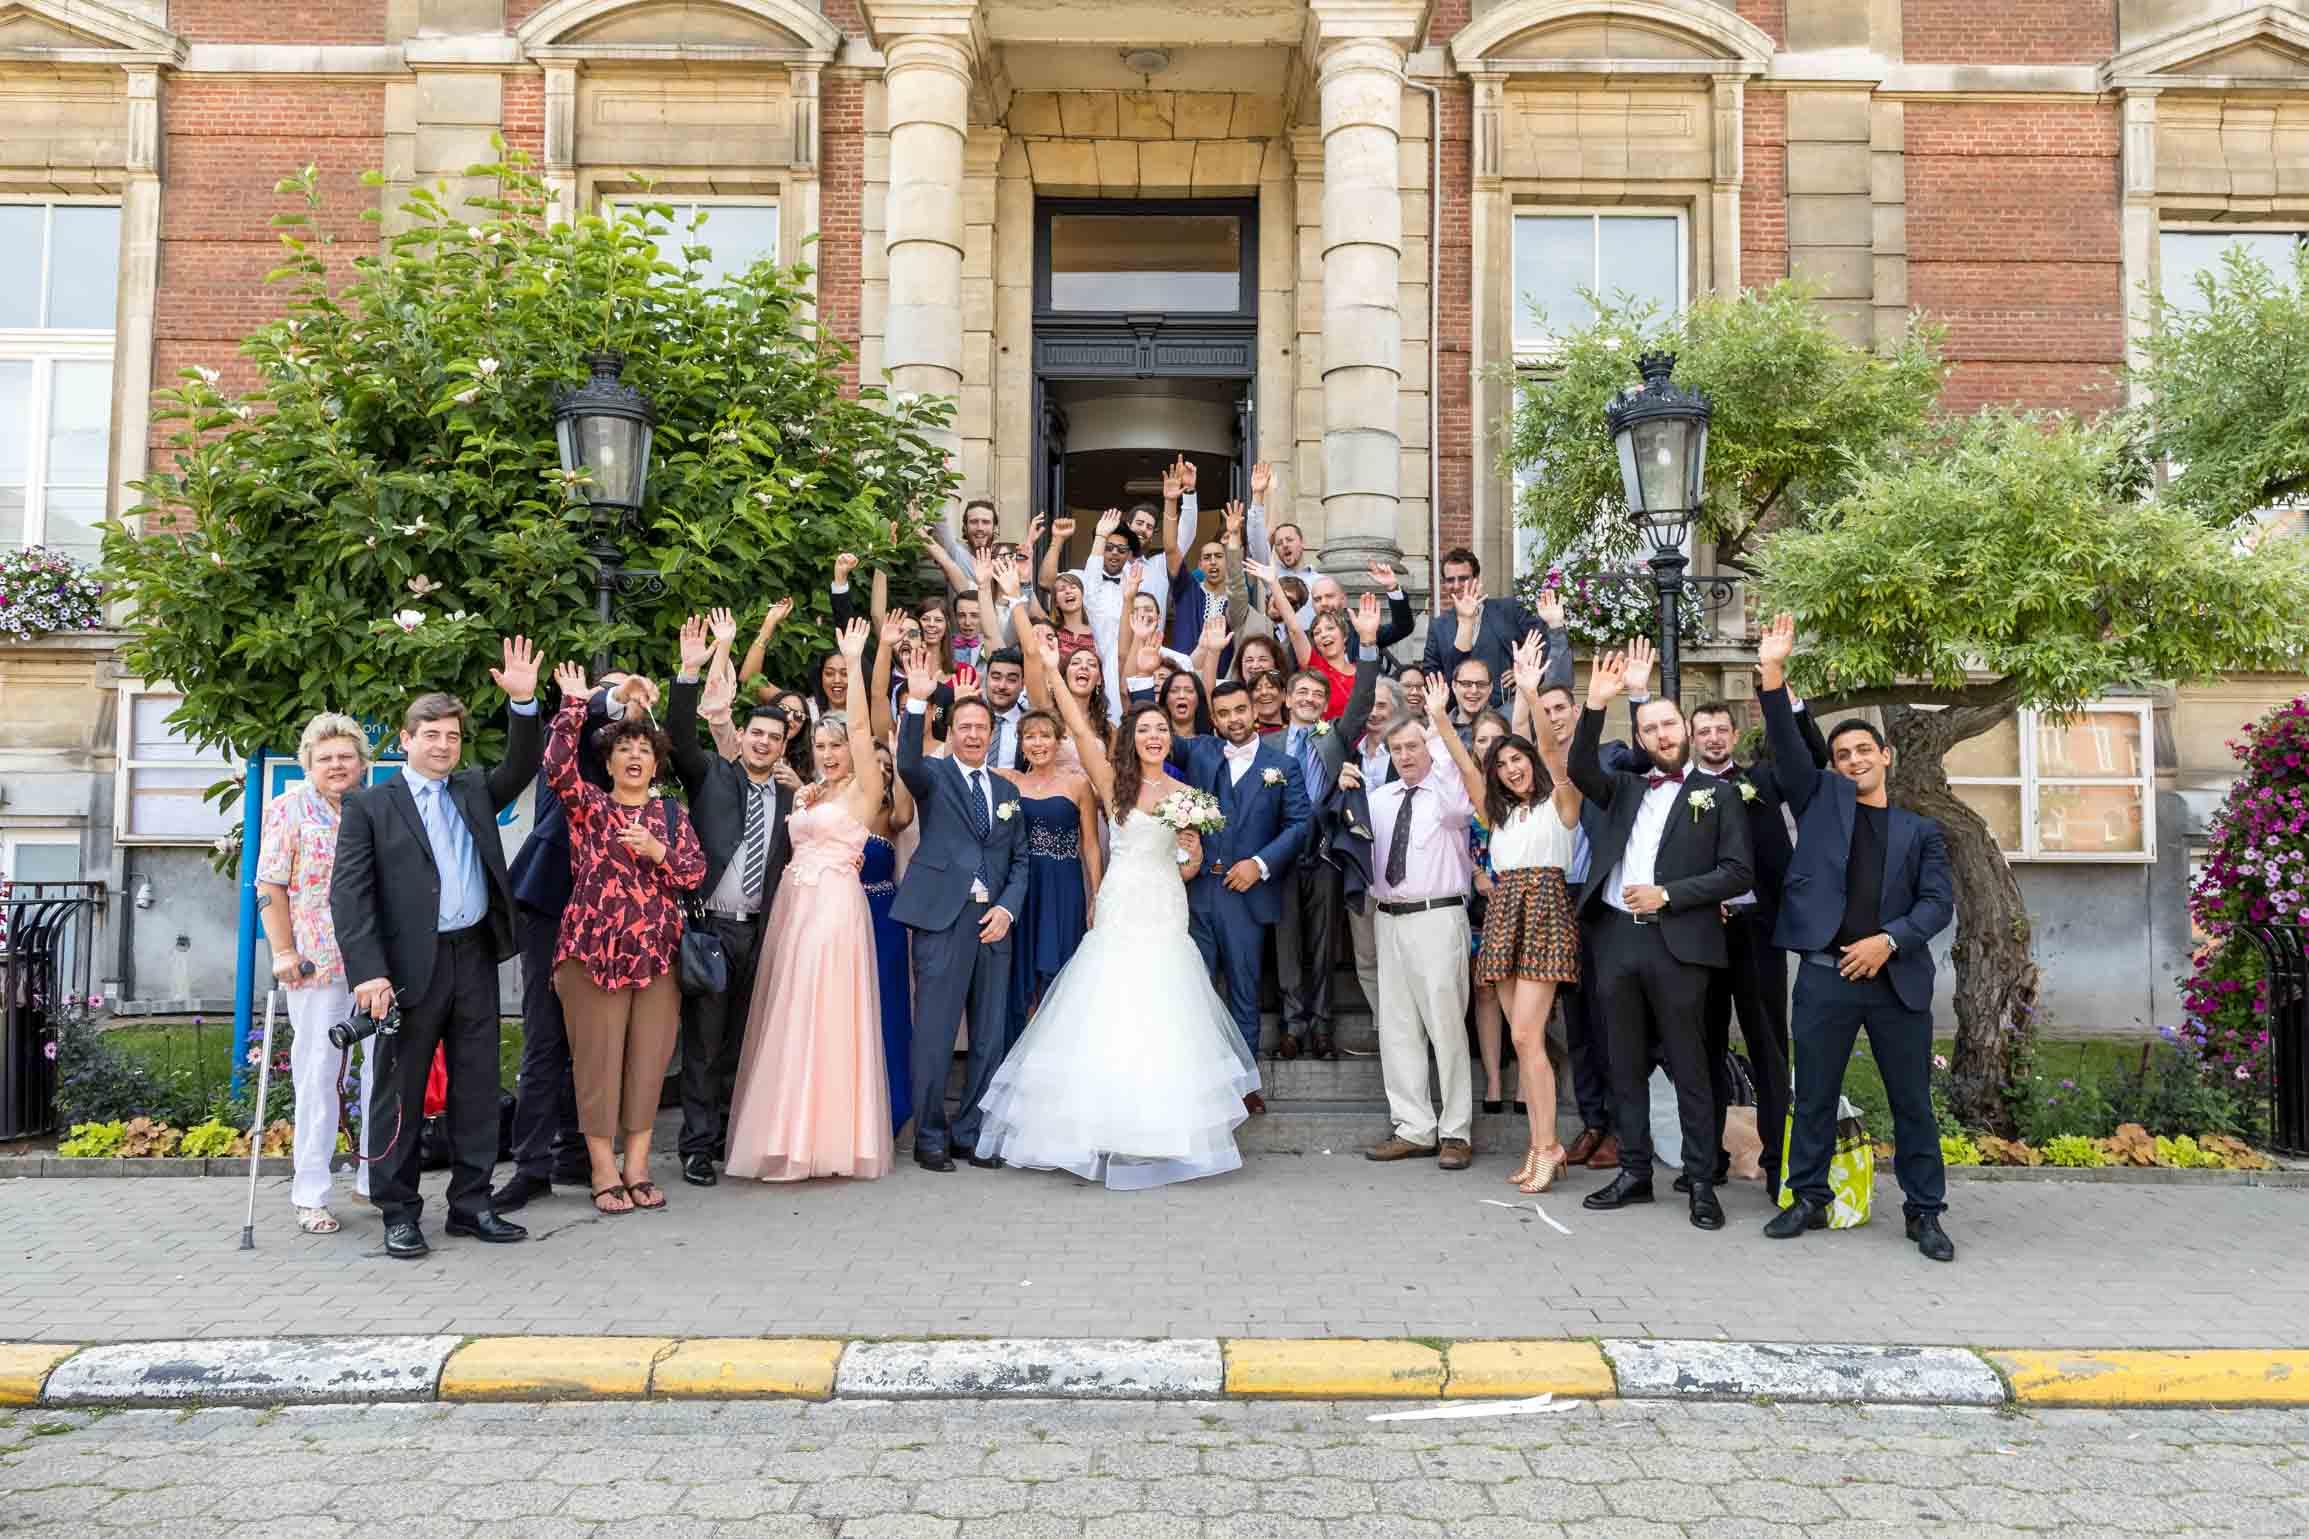 mariage-photo-de-groupe.jpg